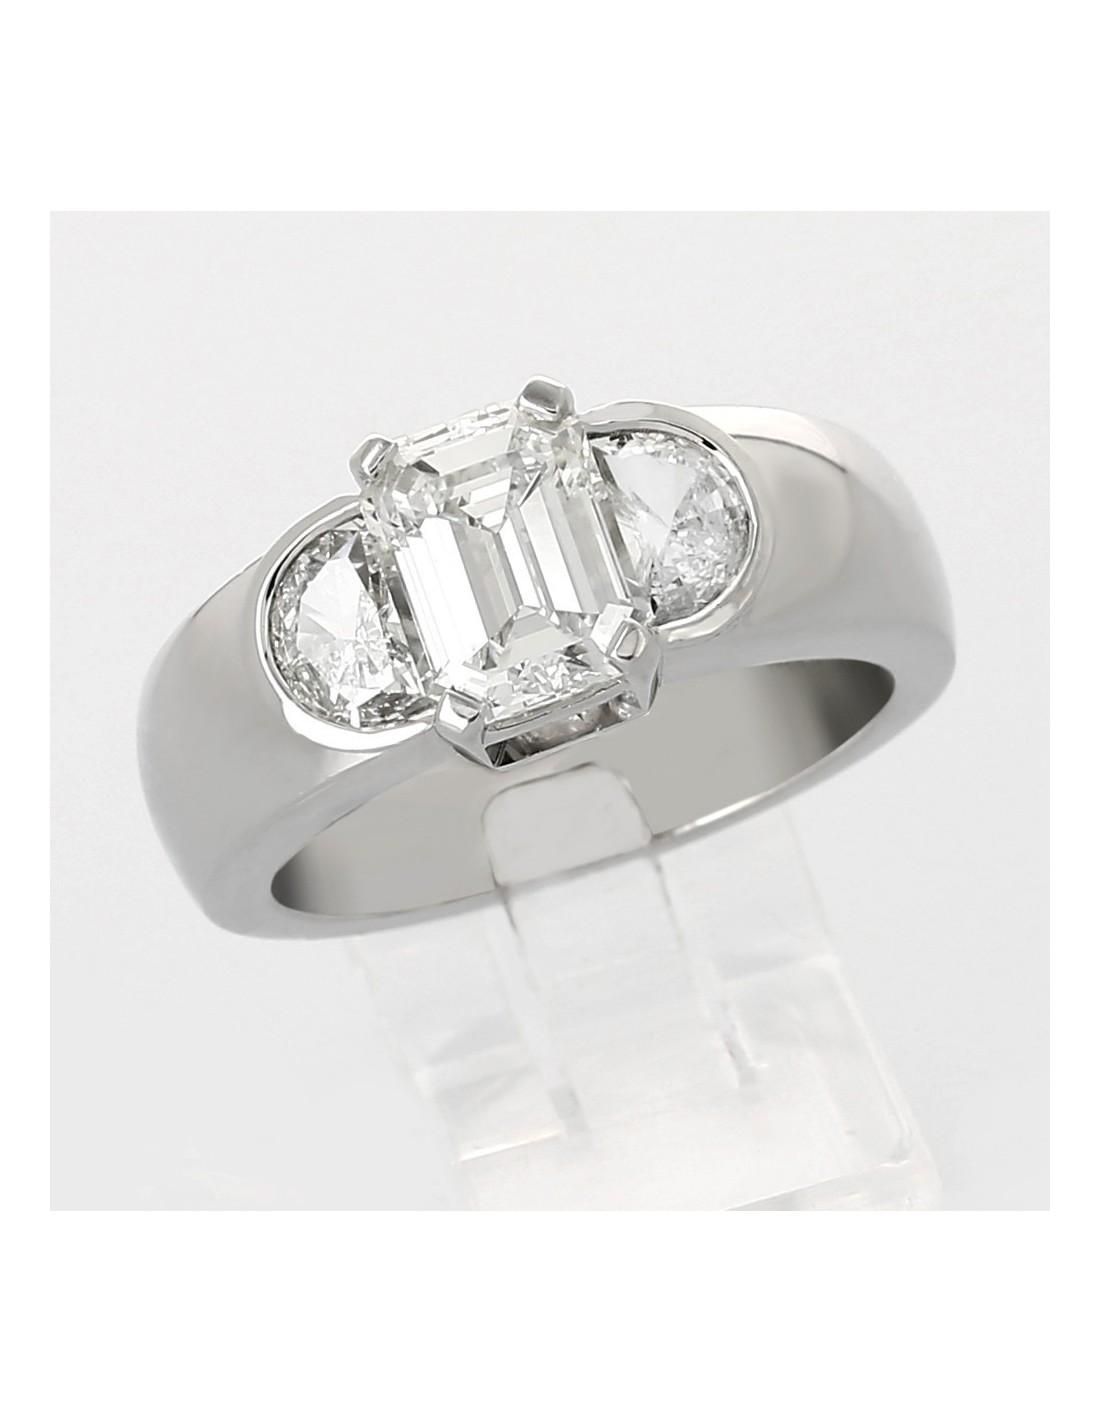 bague diamant taille emeraude kf78 jornalagora. Black Bedroom Furniture Sets. Home Design Ideas